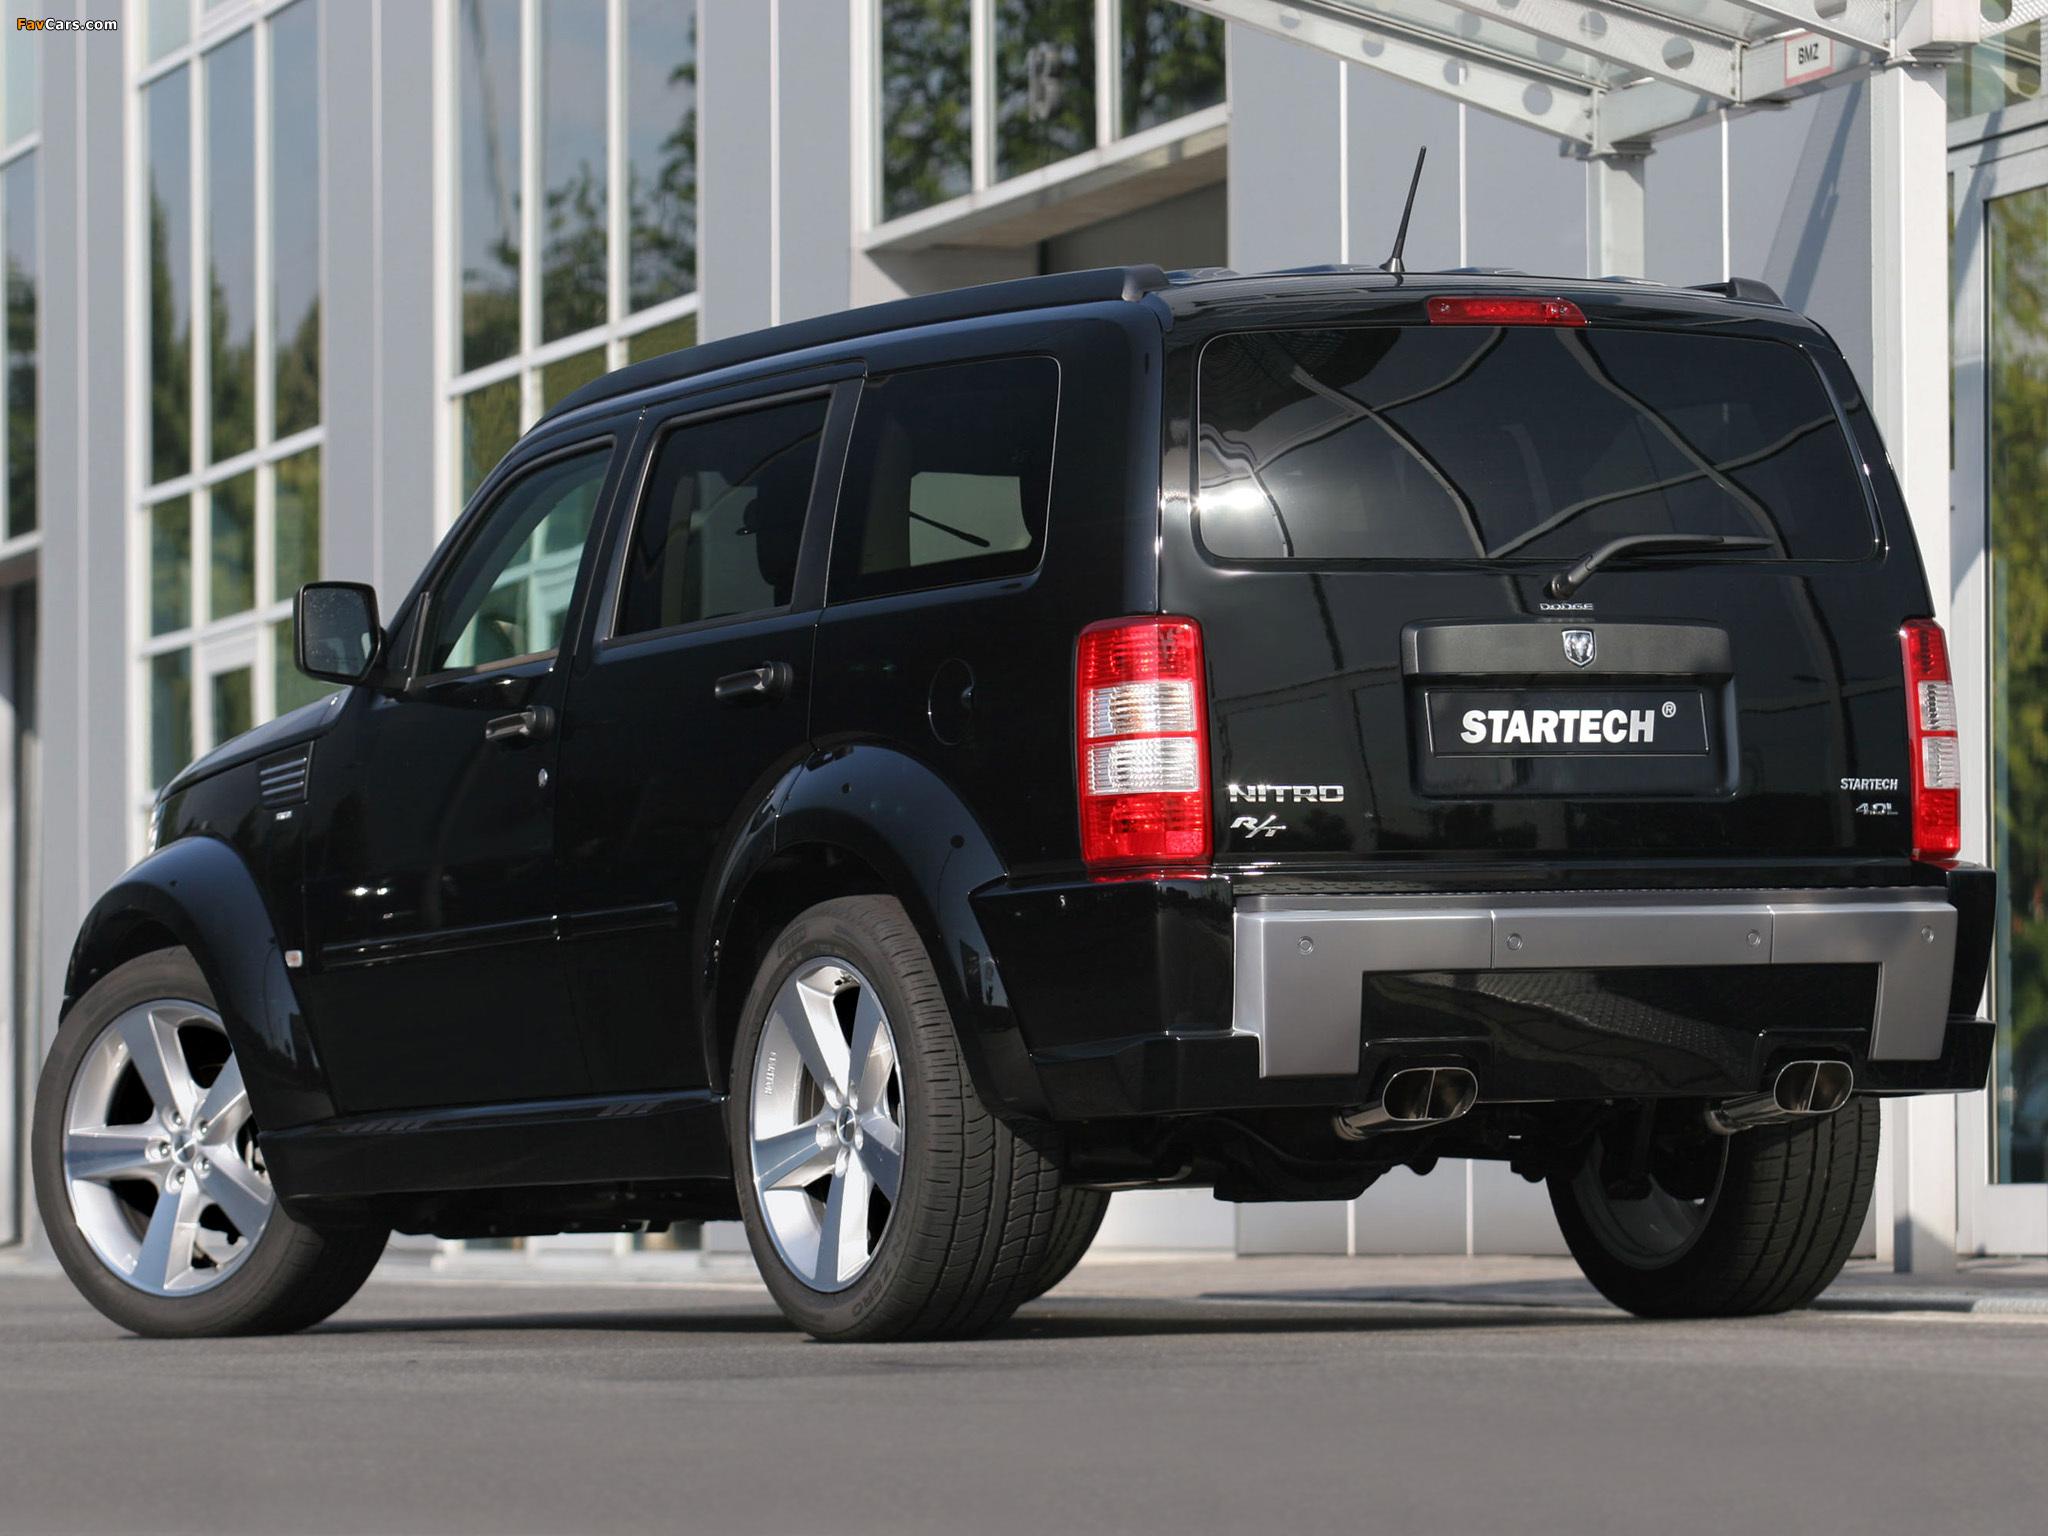 Startech Dodge Nitro 2006 images (2048 x 1536)